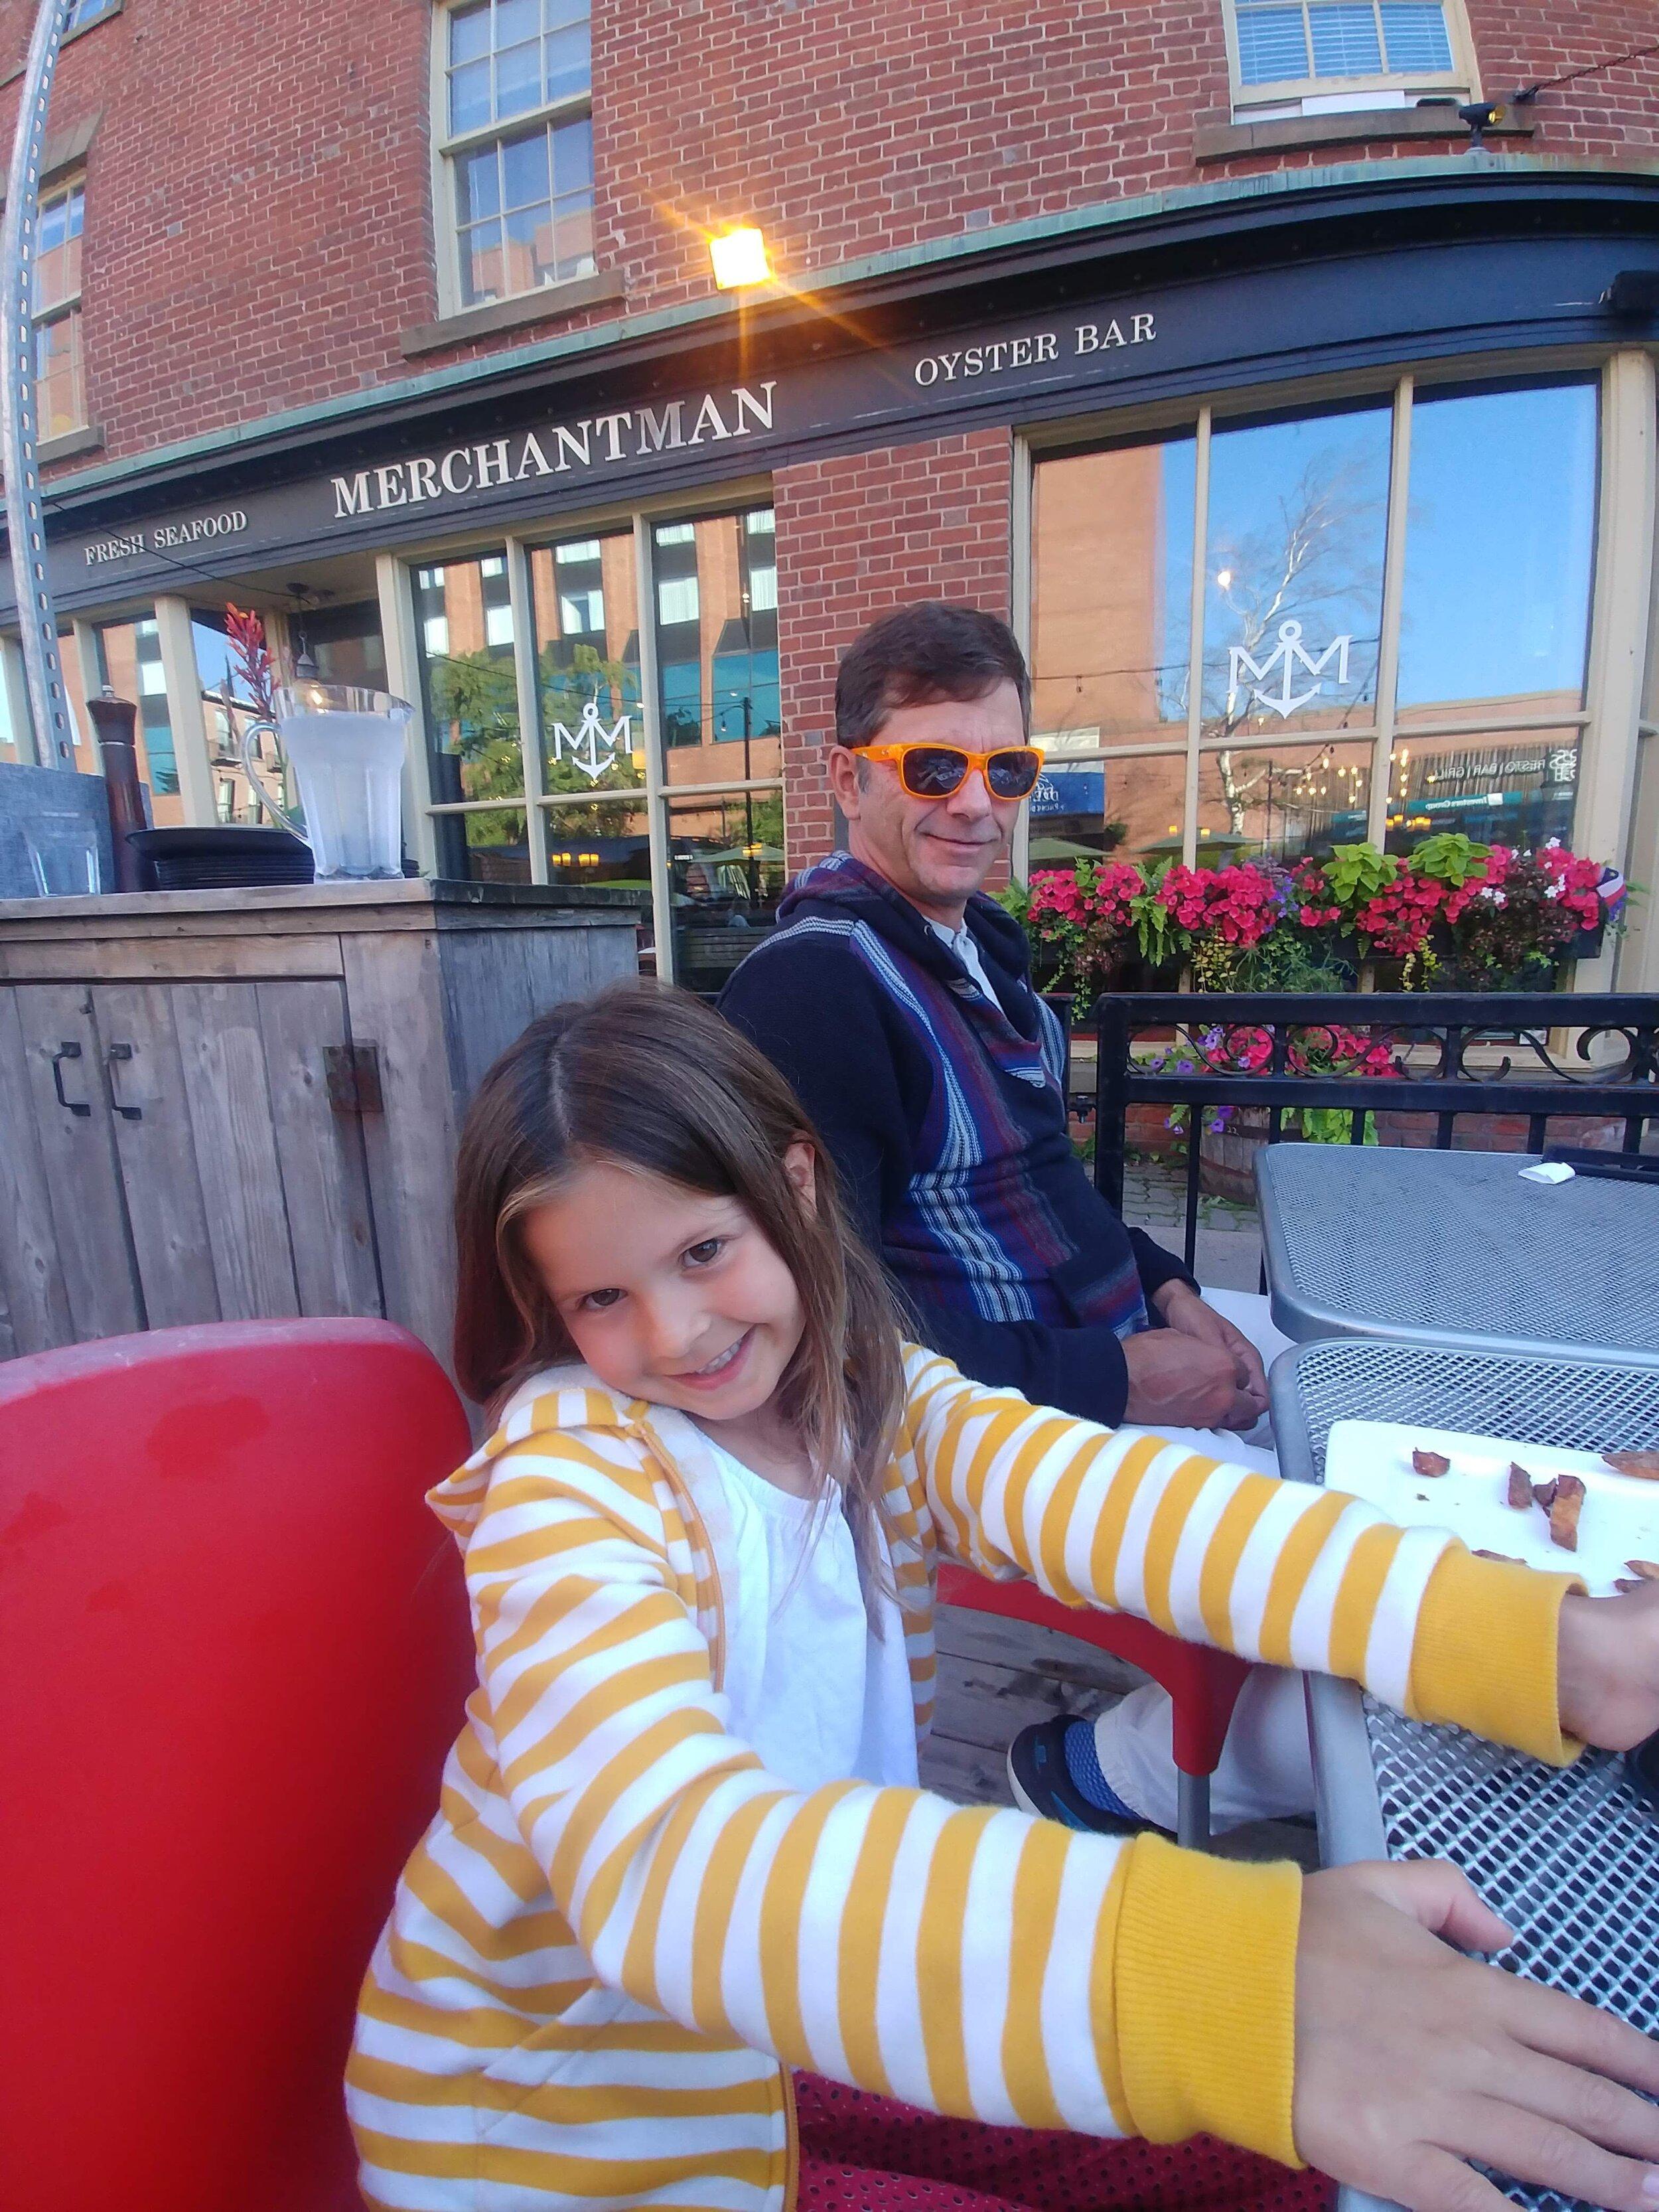 terrasse-ipe-voyage-en-famille-wow-merchantman-enfants-bienvenus